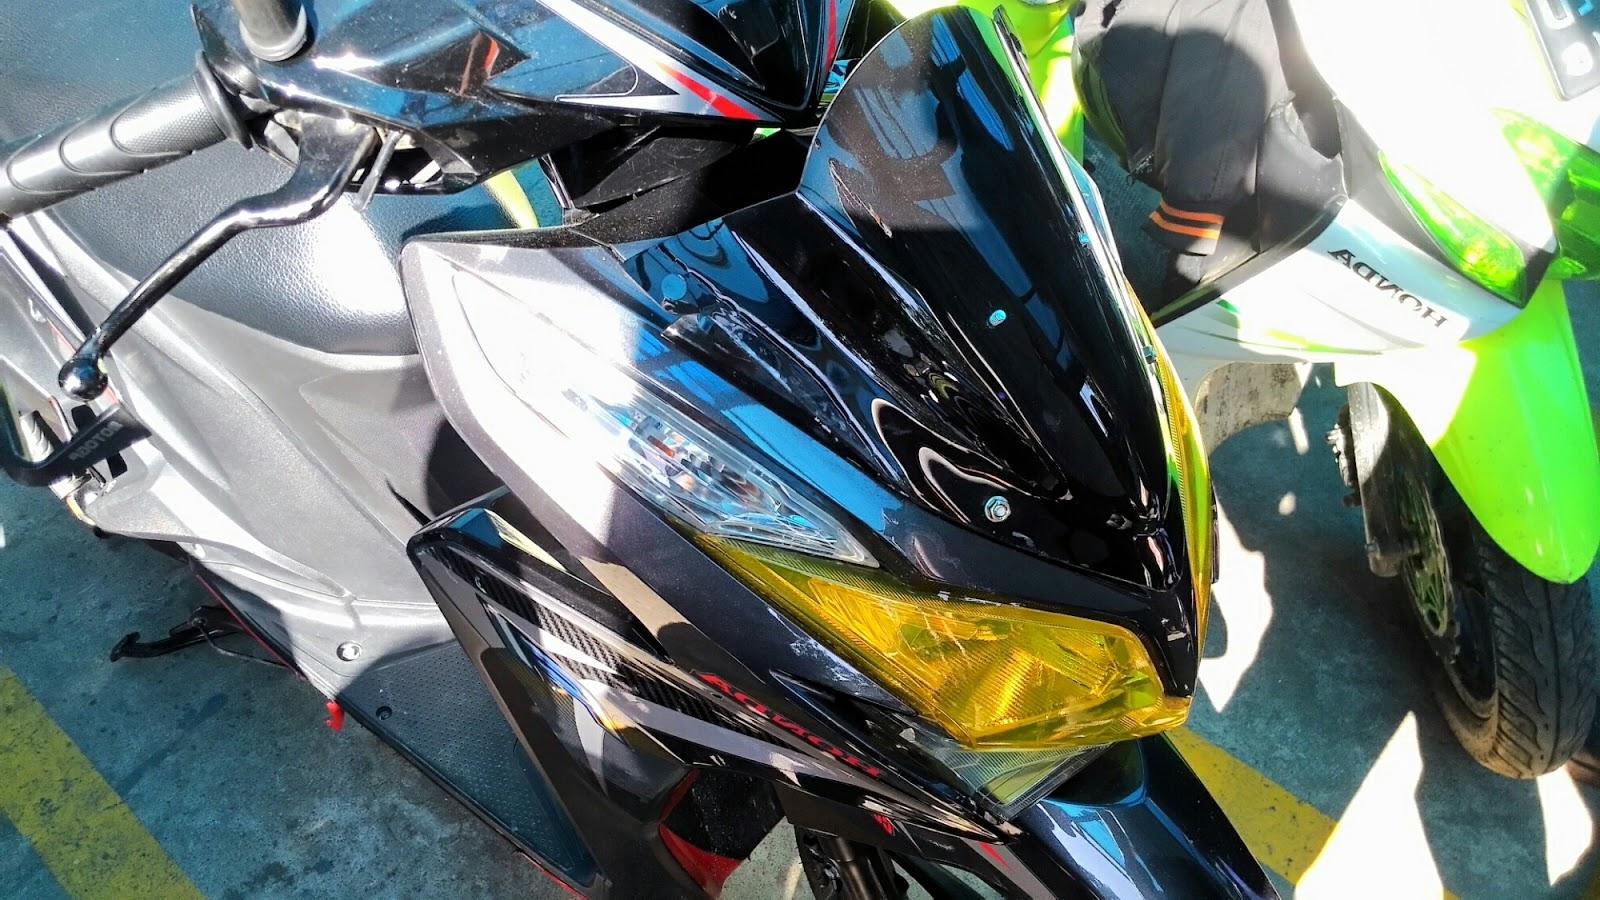 Kumpulan Harga Modifikasi Motor Vario Techno Terlengkap Codot